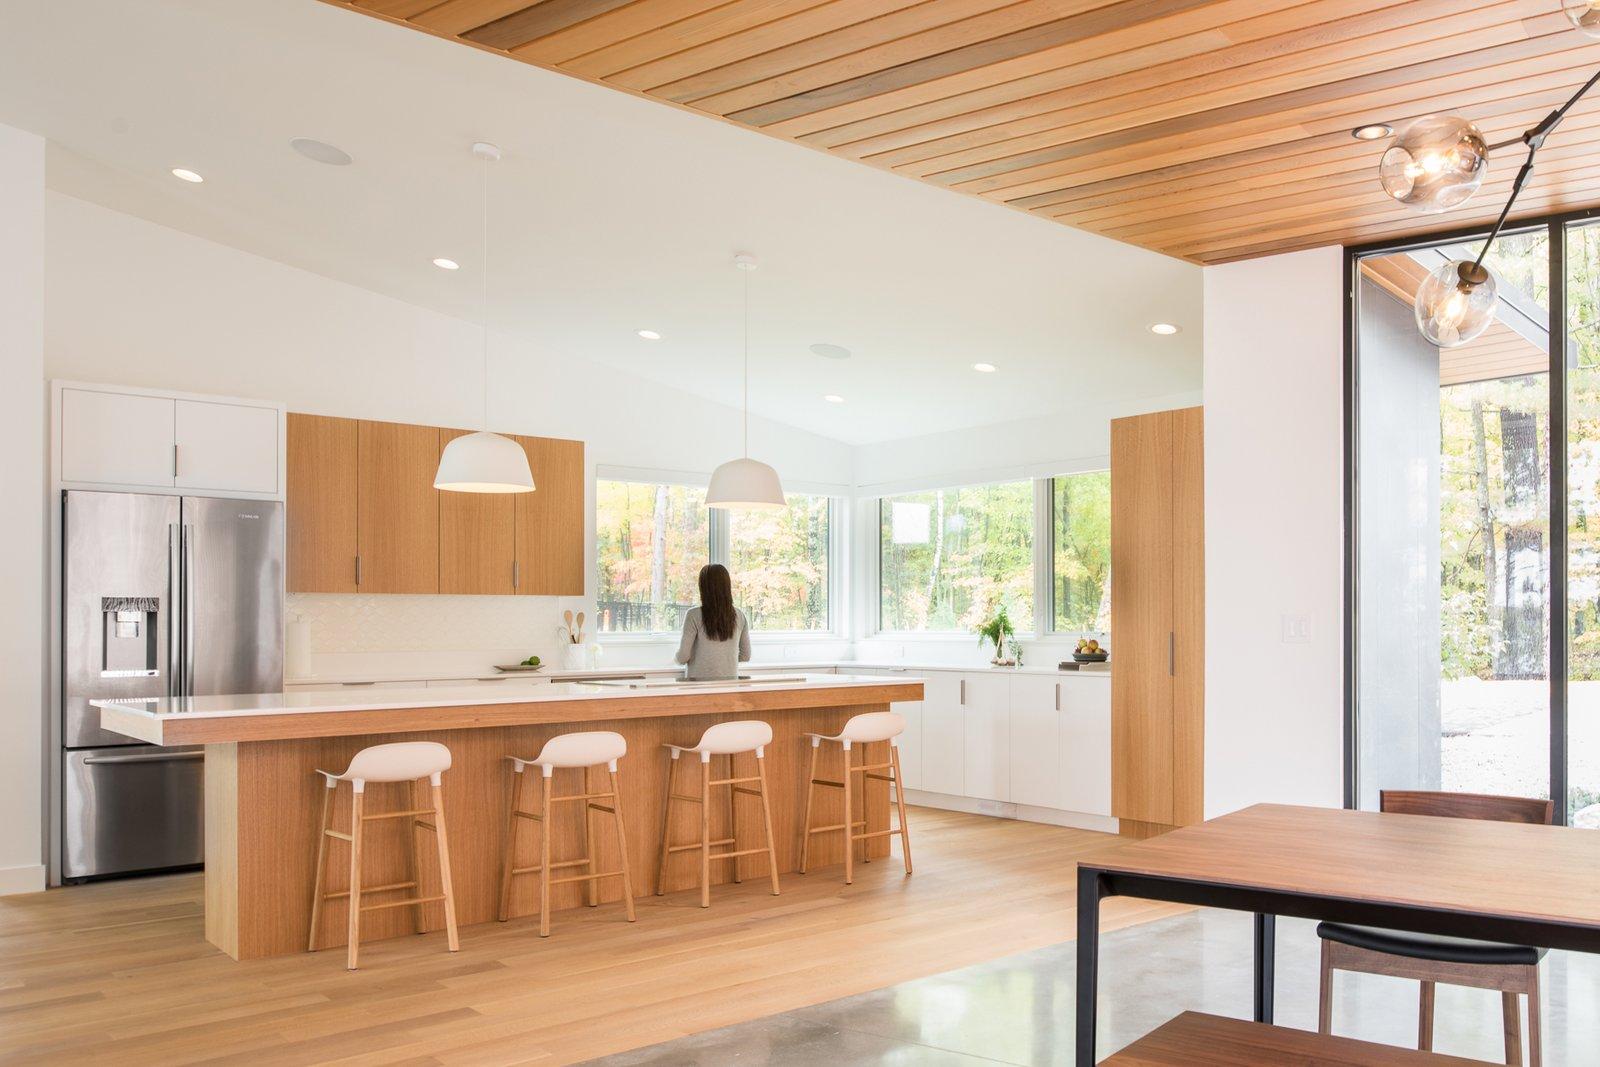 Kitchen, Engineered Quartz, Wood, White, Light Hardwood, Concrete, Ceramic Tile, Ceiling, Refrigerator, Undermount, and Range  Best Kitchen Concrete Undermount Refrigerator White Engineered Quartz Ceiling Photos from Northern Lake Home